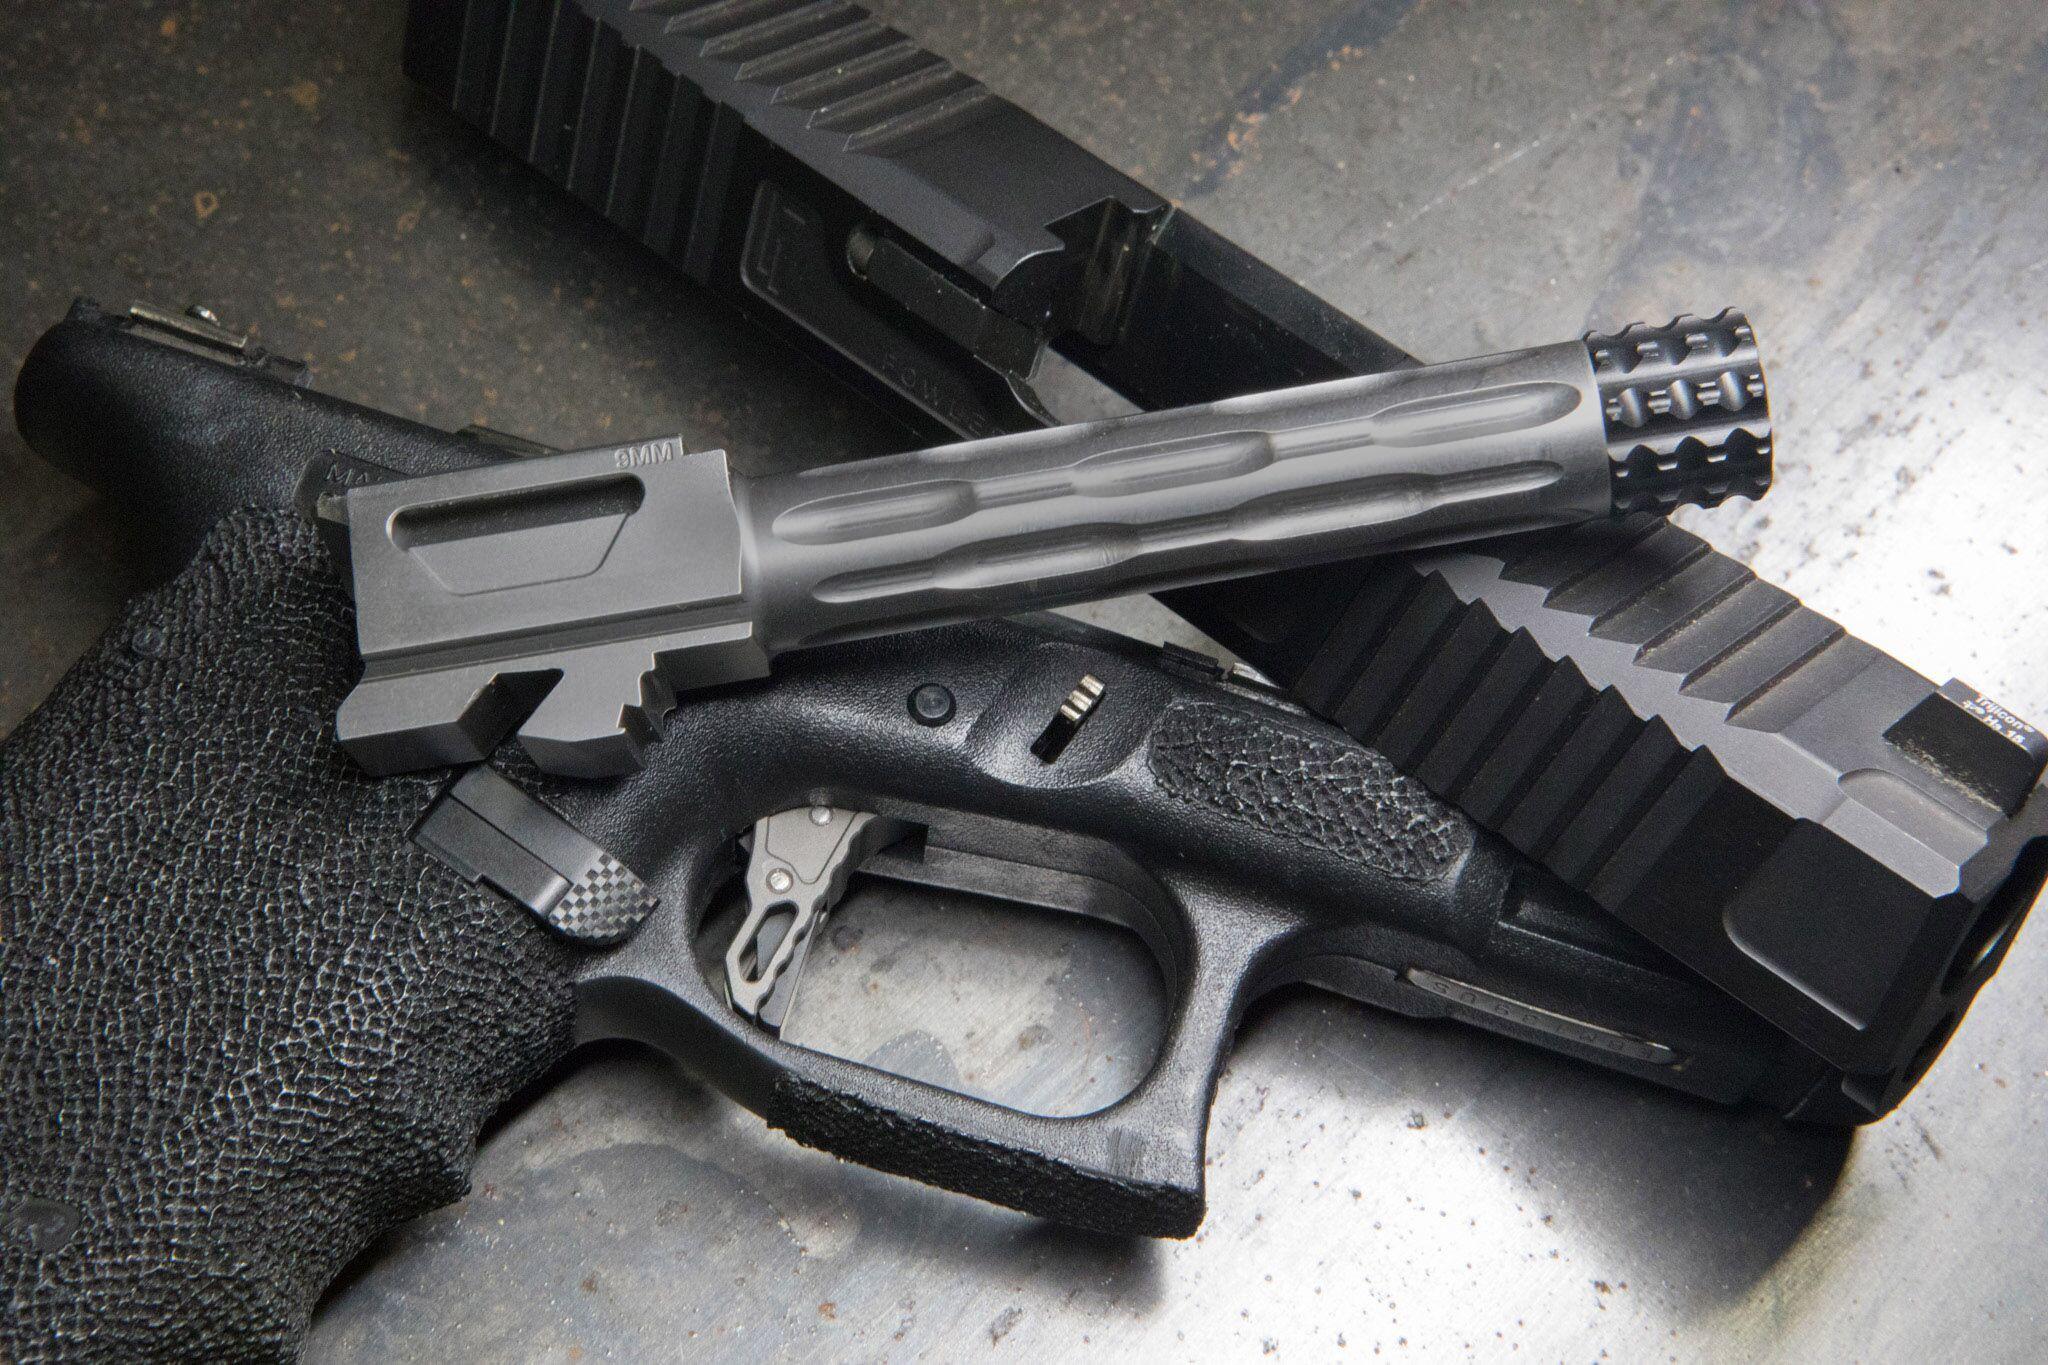 Velocity Arms Glock 19 Threaded GP Barrel W/ Thread Protector MDC Finish